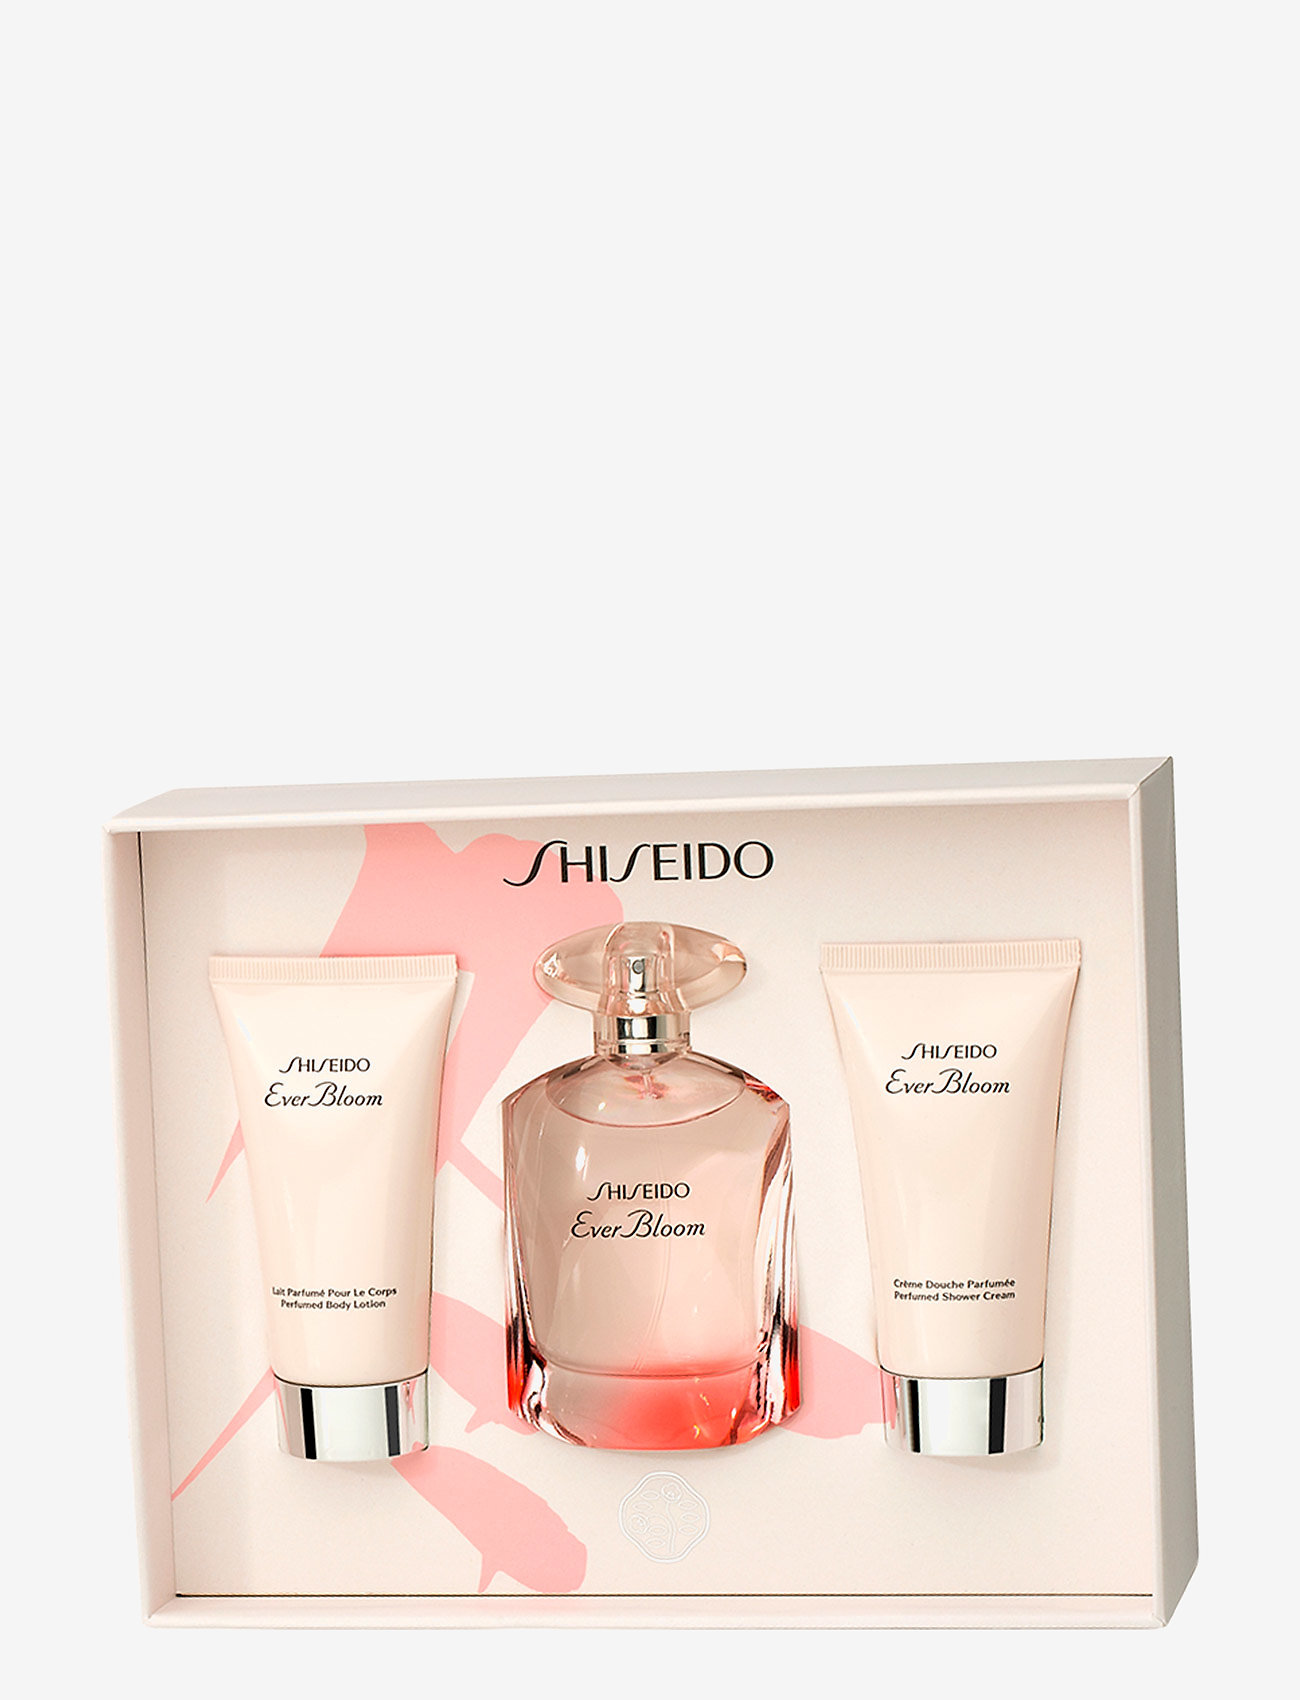 Shiseido - EVER BLOOM EDP 50/BODY LOTION 50/SHOWER CREAM 50ML - tuoksusetit - no color - 1